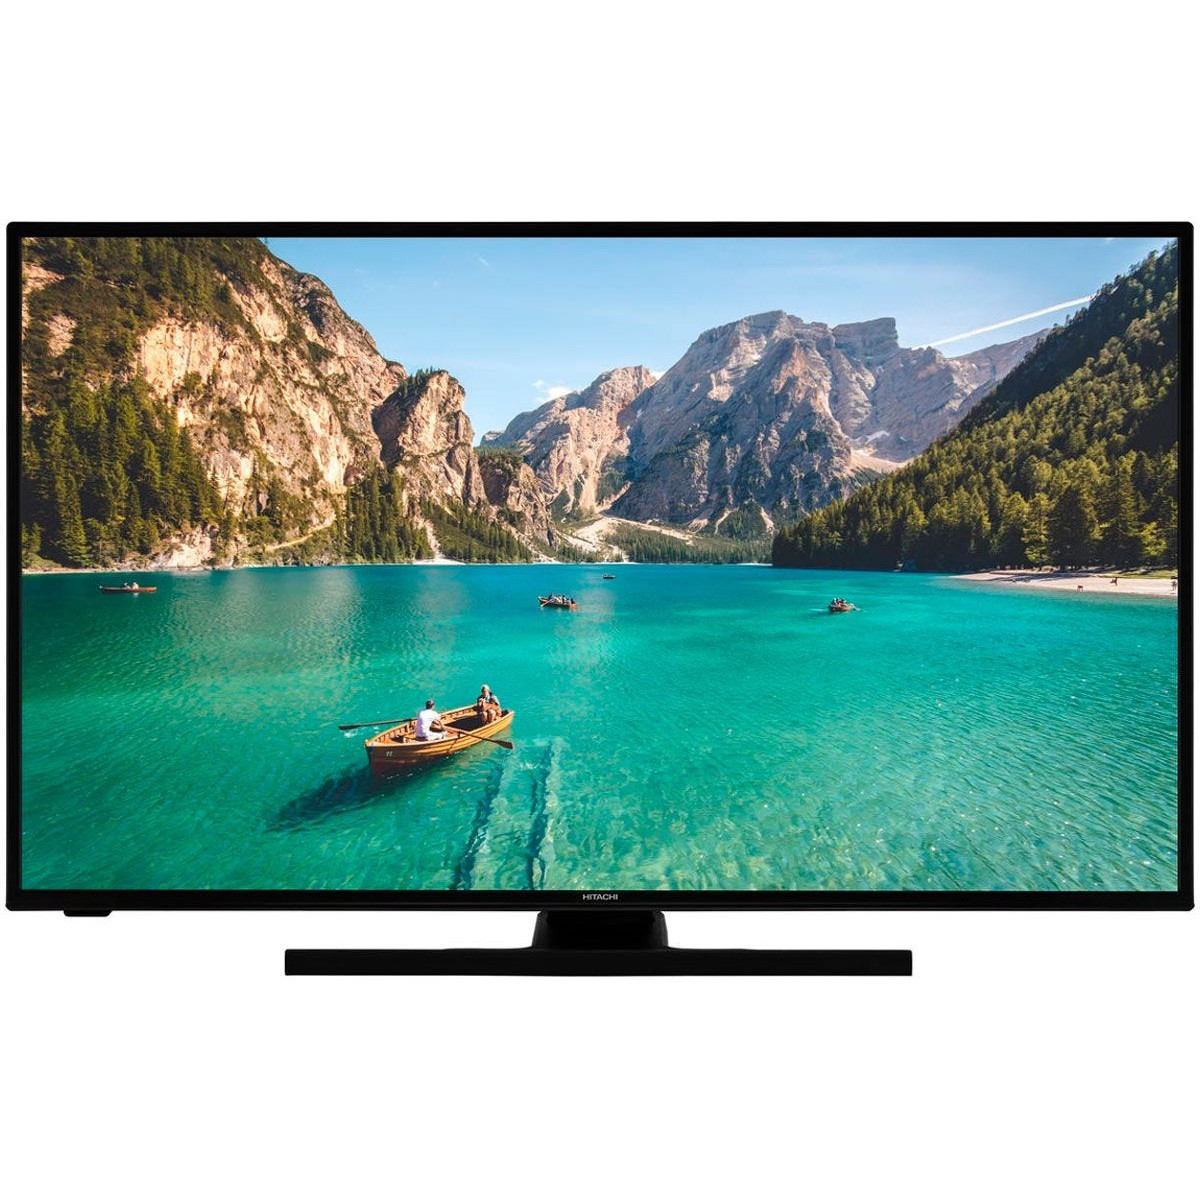 Tv 32 Hitachi 32he2200 Hd Ready Smart Tv (Peana Central)